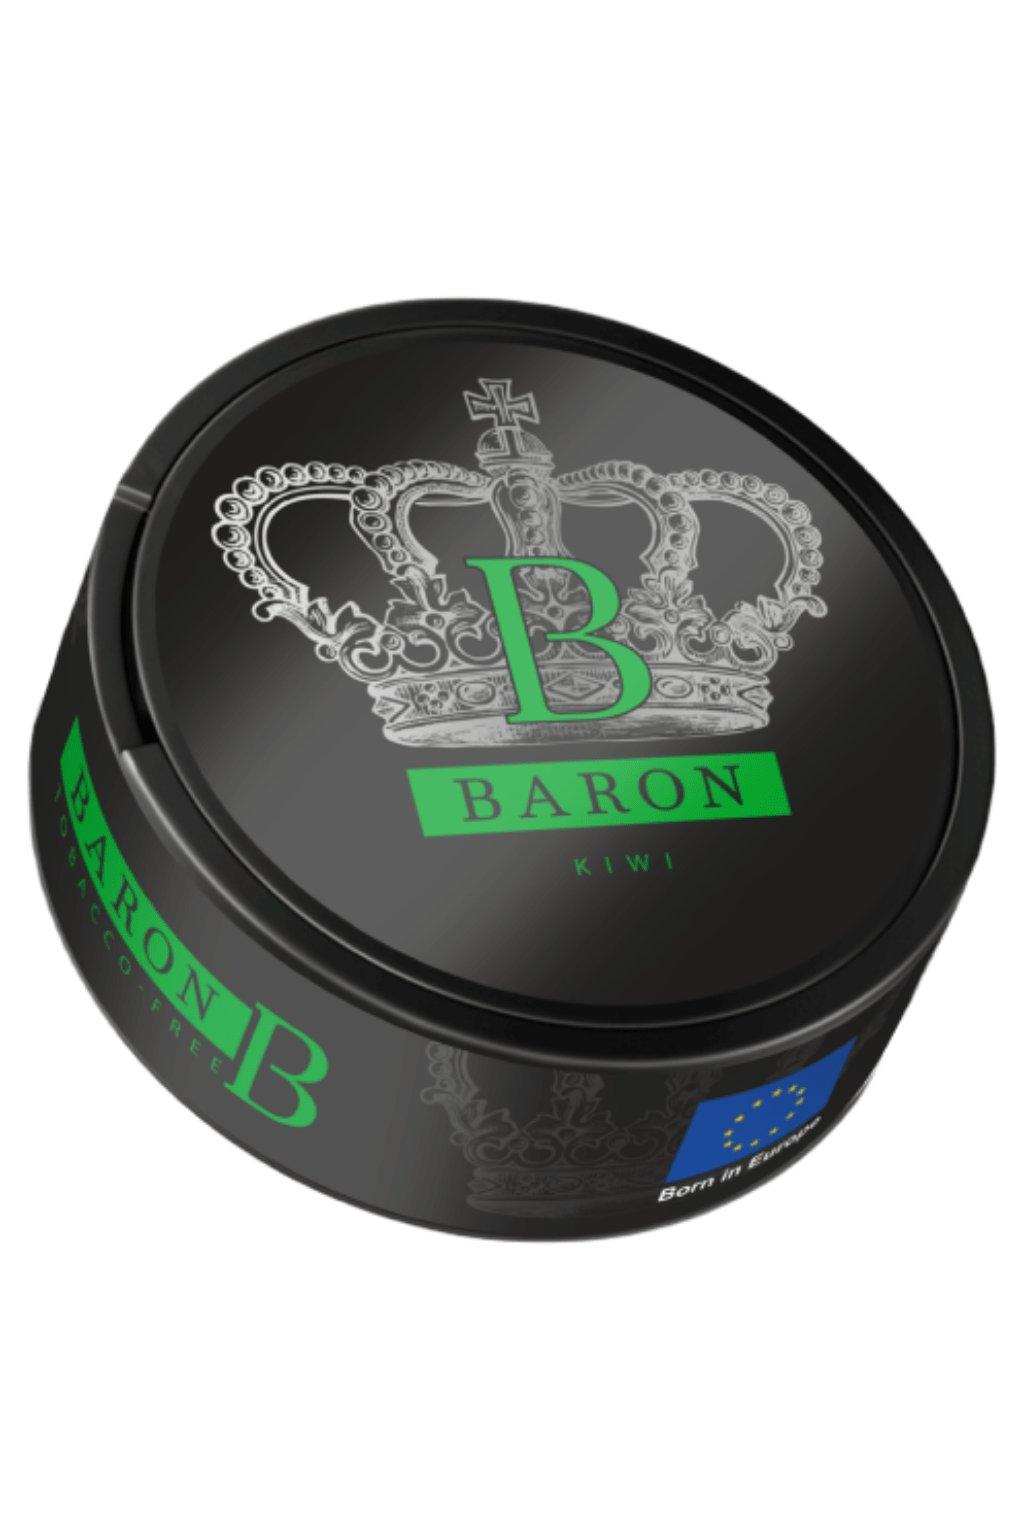 Baron kiwi nikotinove sacky min